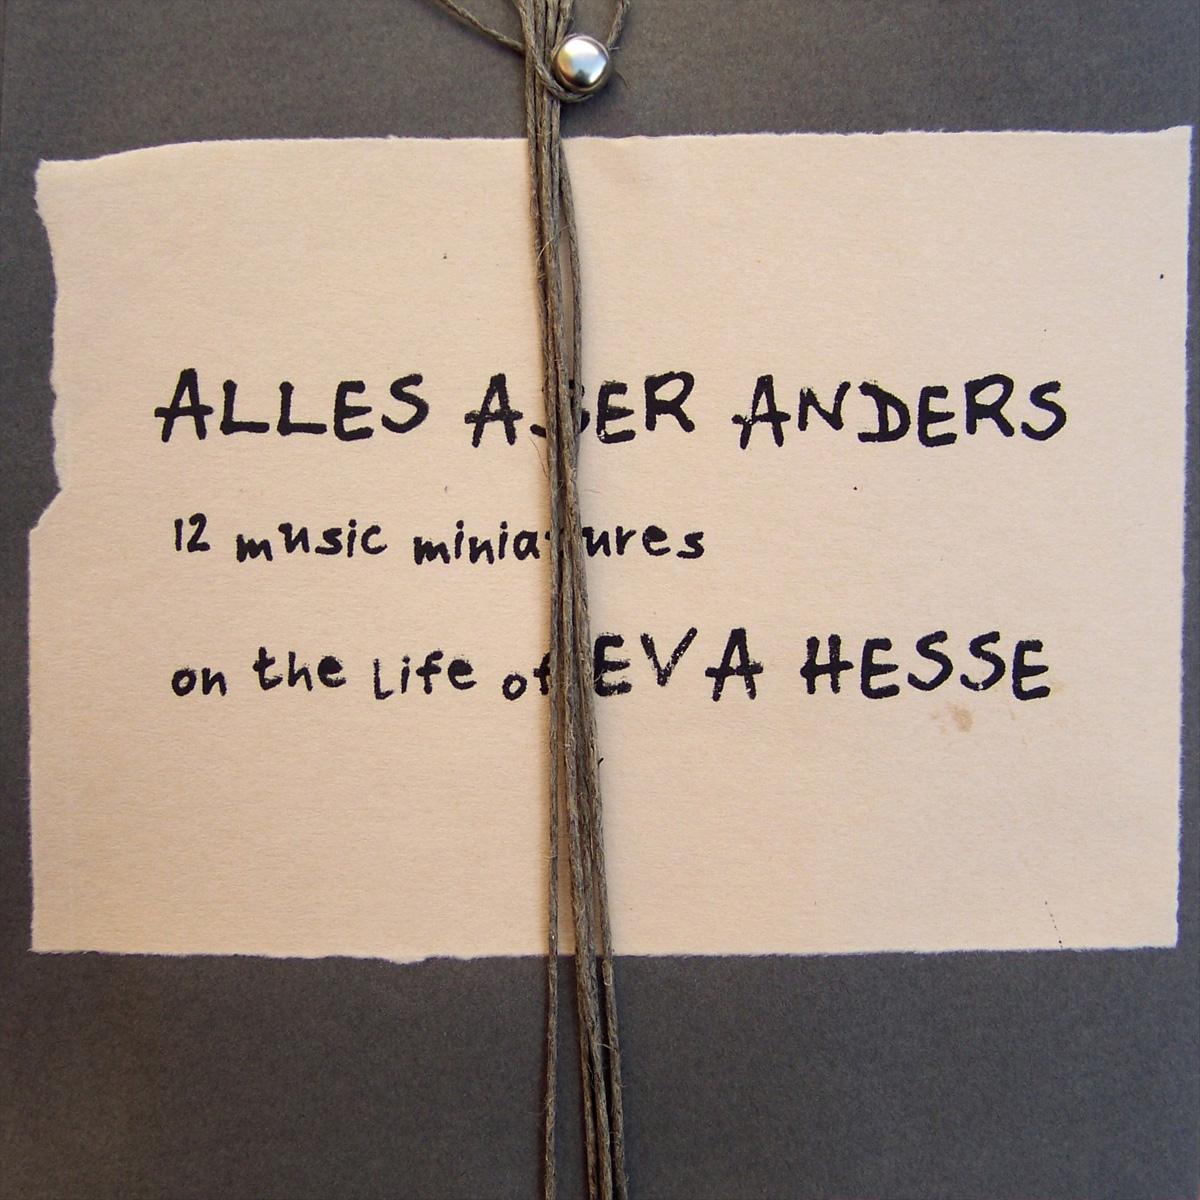 ALLES ABER ANDERS